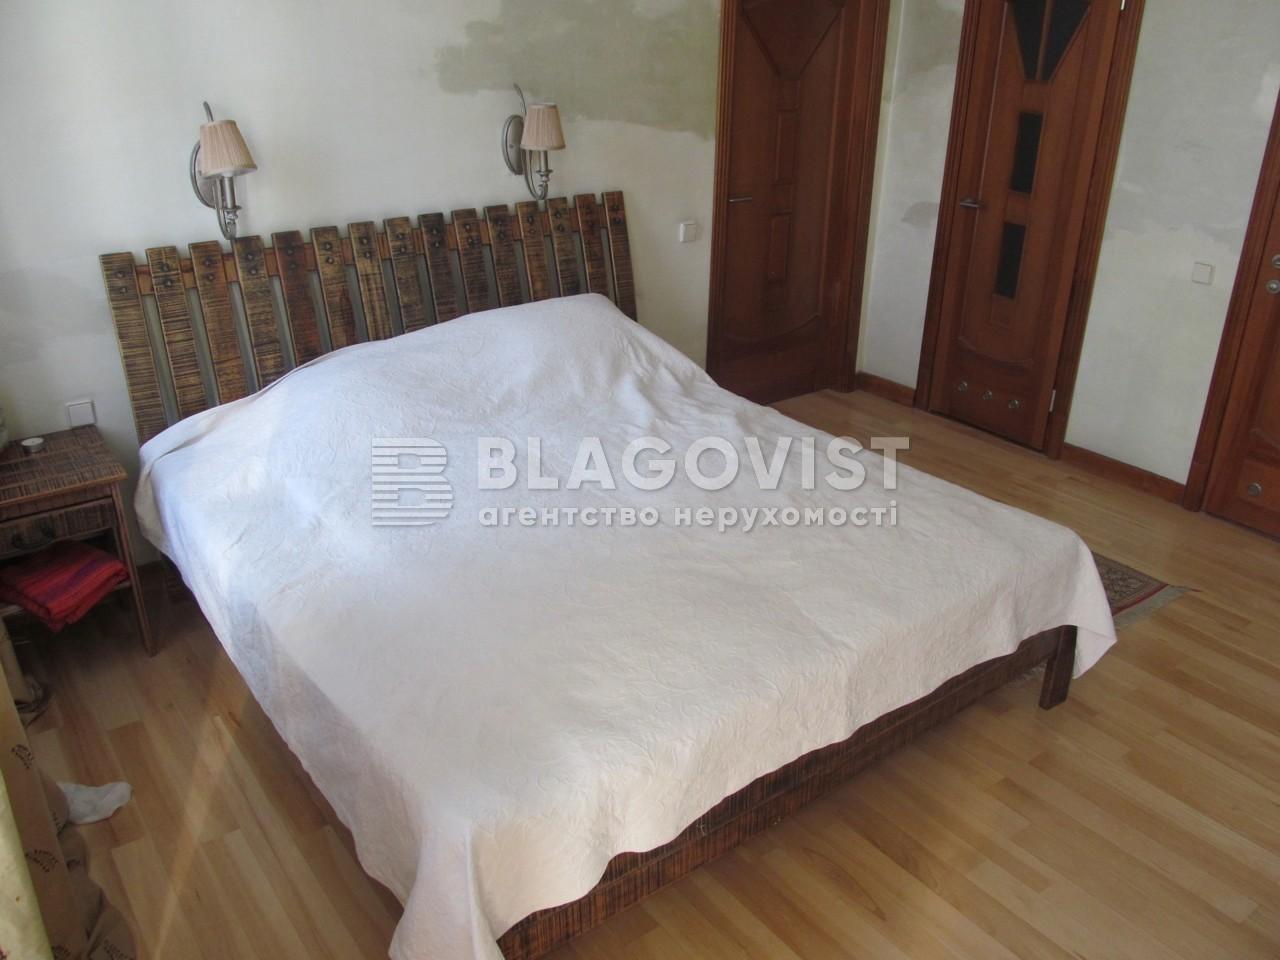 Квартира C-103021, Деловая (Димитрова), 13, Киев - Фото 6